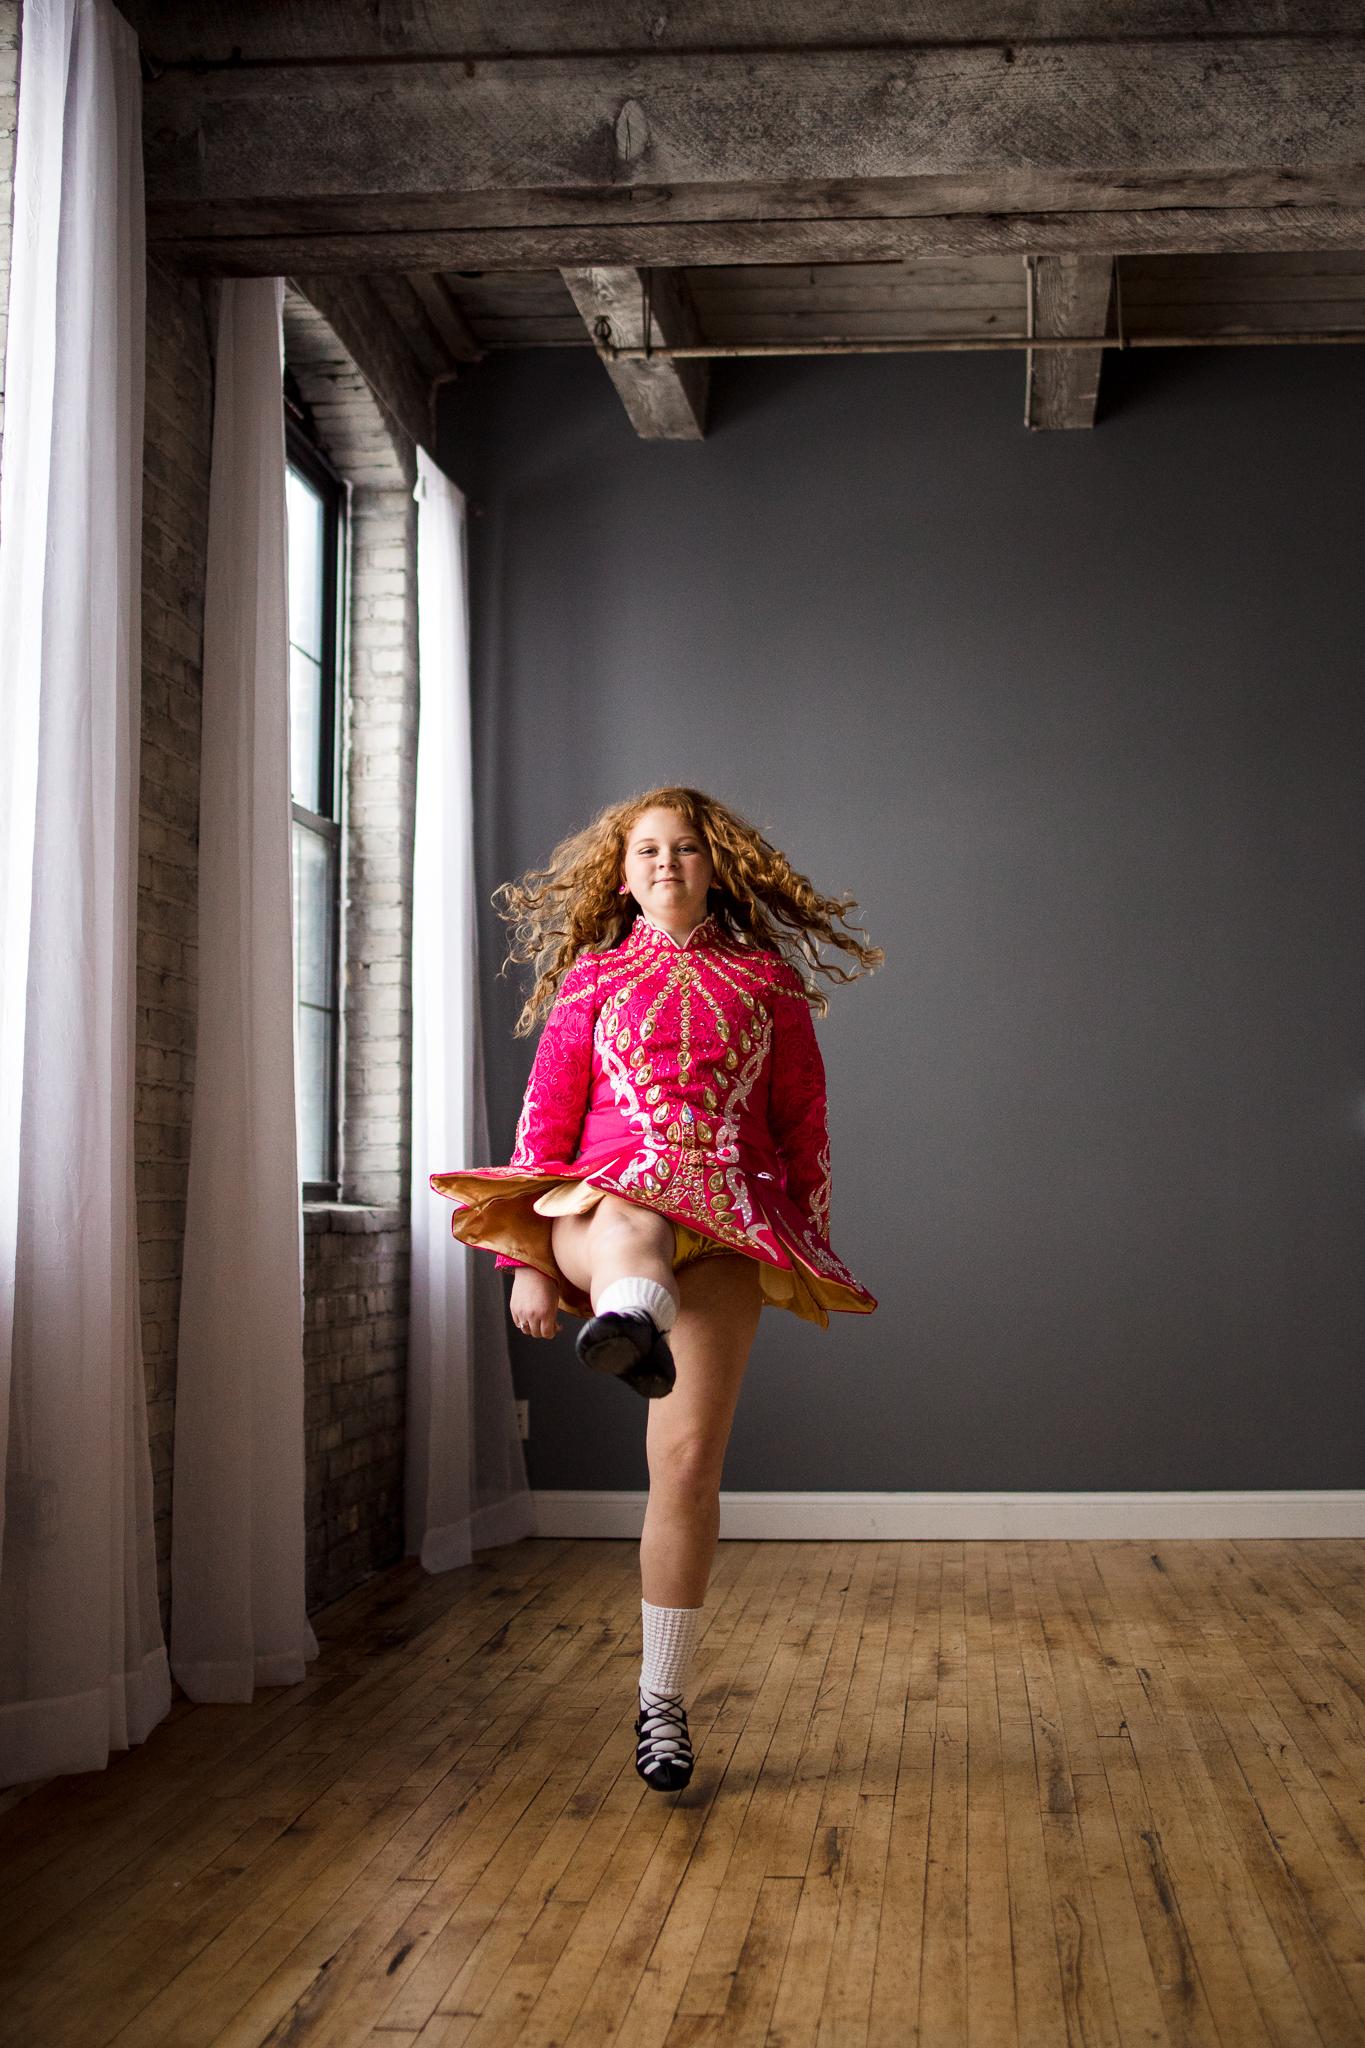 dark pink Irish Dance dress with white socks and black shoes - Wayzata Artistic Family Photographer